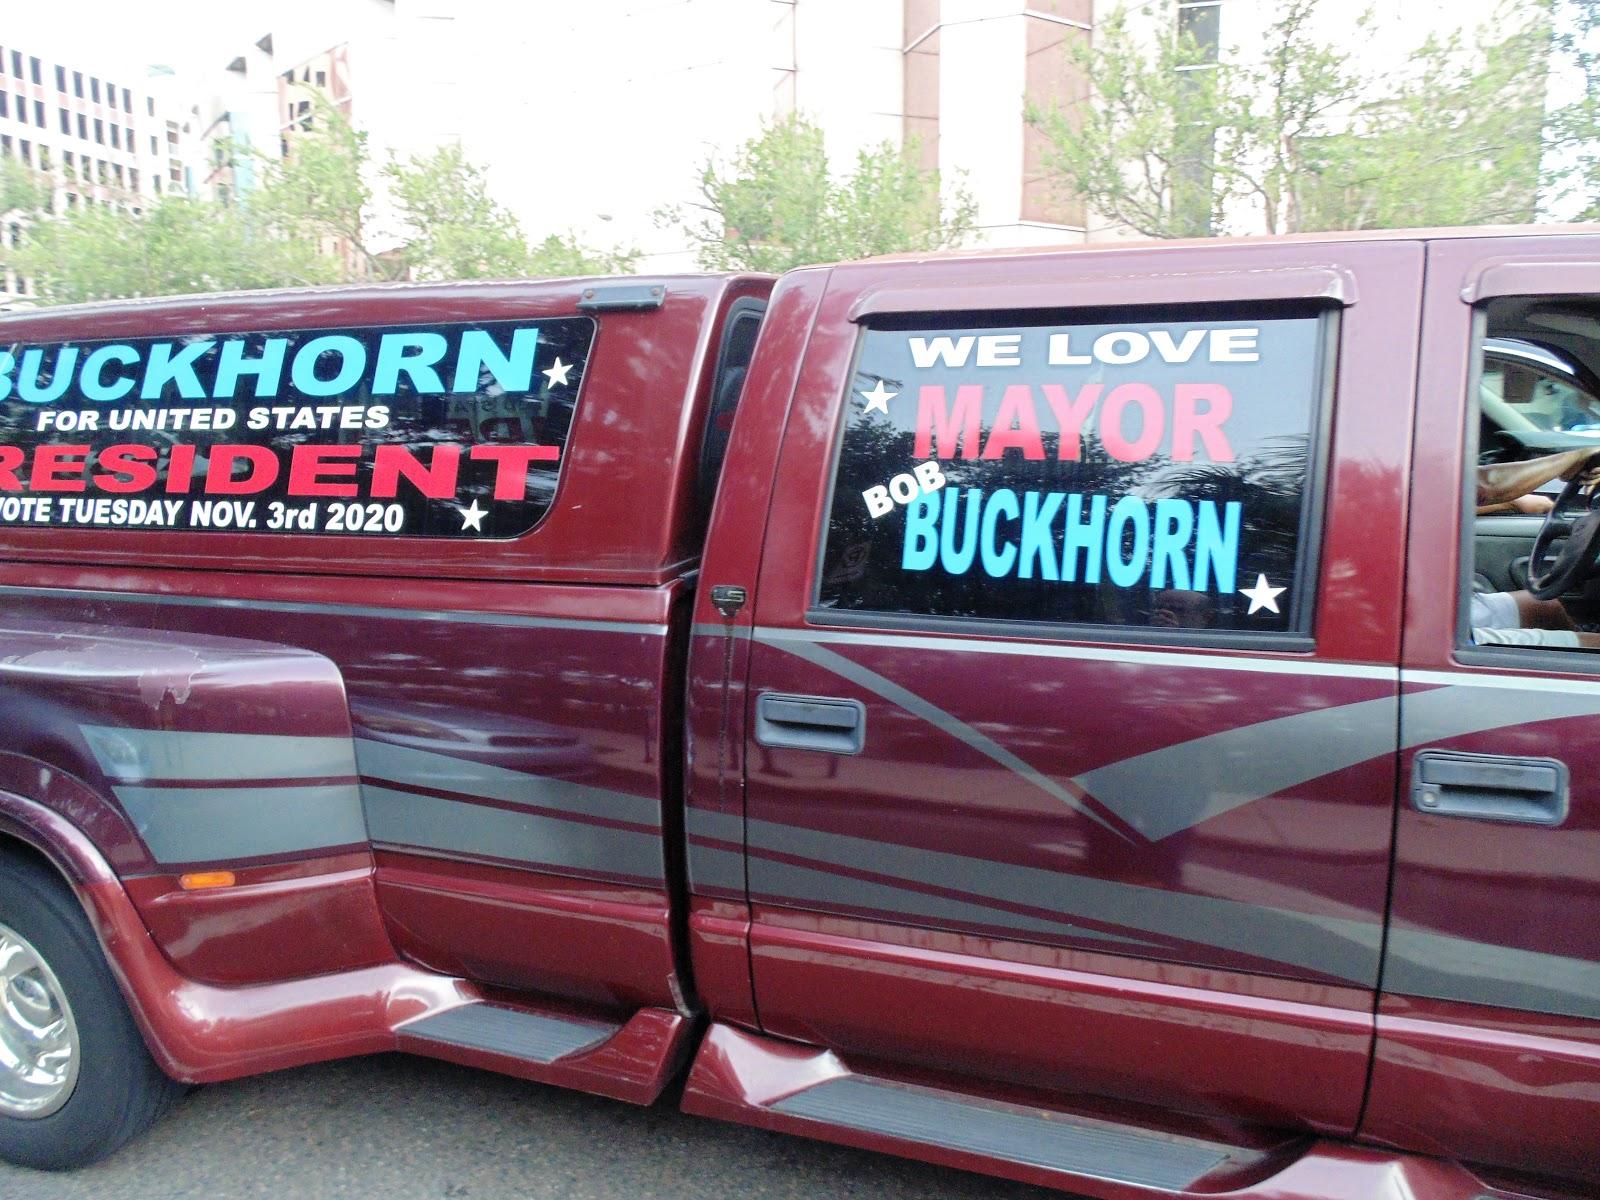 The Ybor City Stogie Bob Buckhorn For President